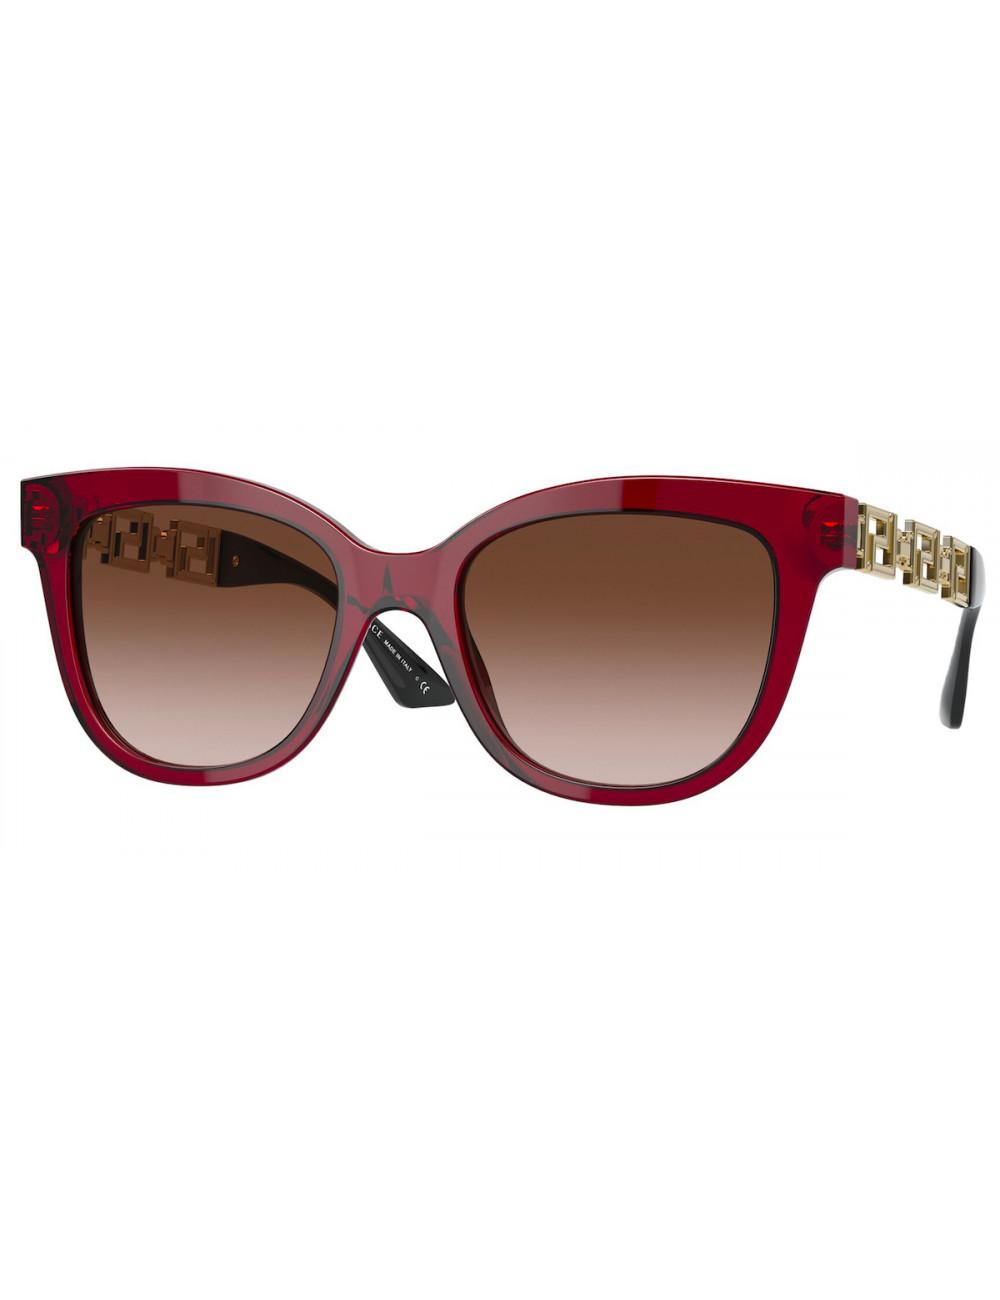 Versace Greca VE4394 388/13